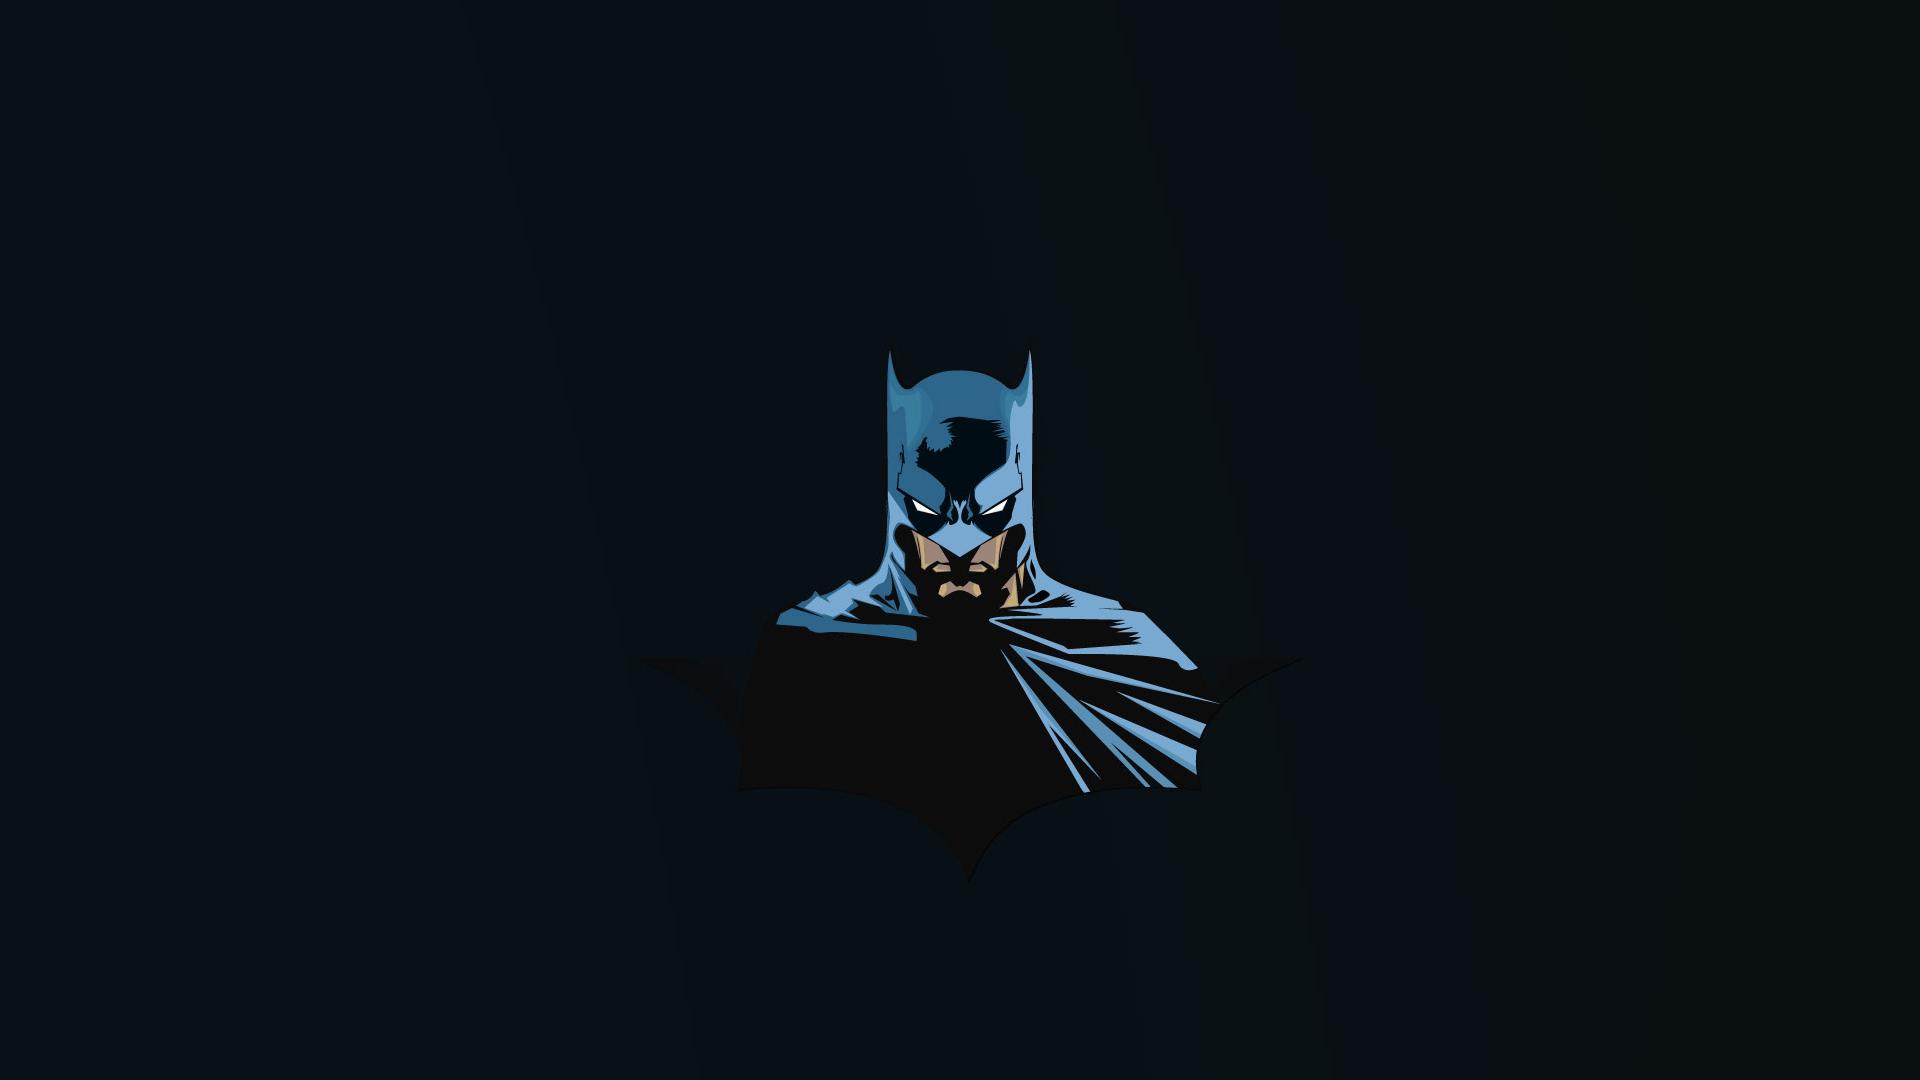 Iphone 6s Plus 4k Wallpaper: 1080x1920 Batman Minimalism HD Iphone 7,6s,6 Plus, Pixel